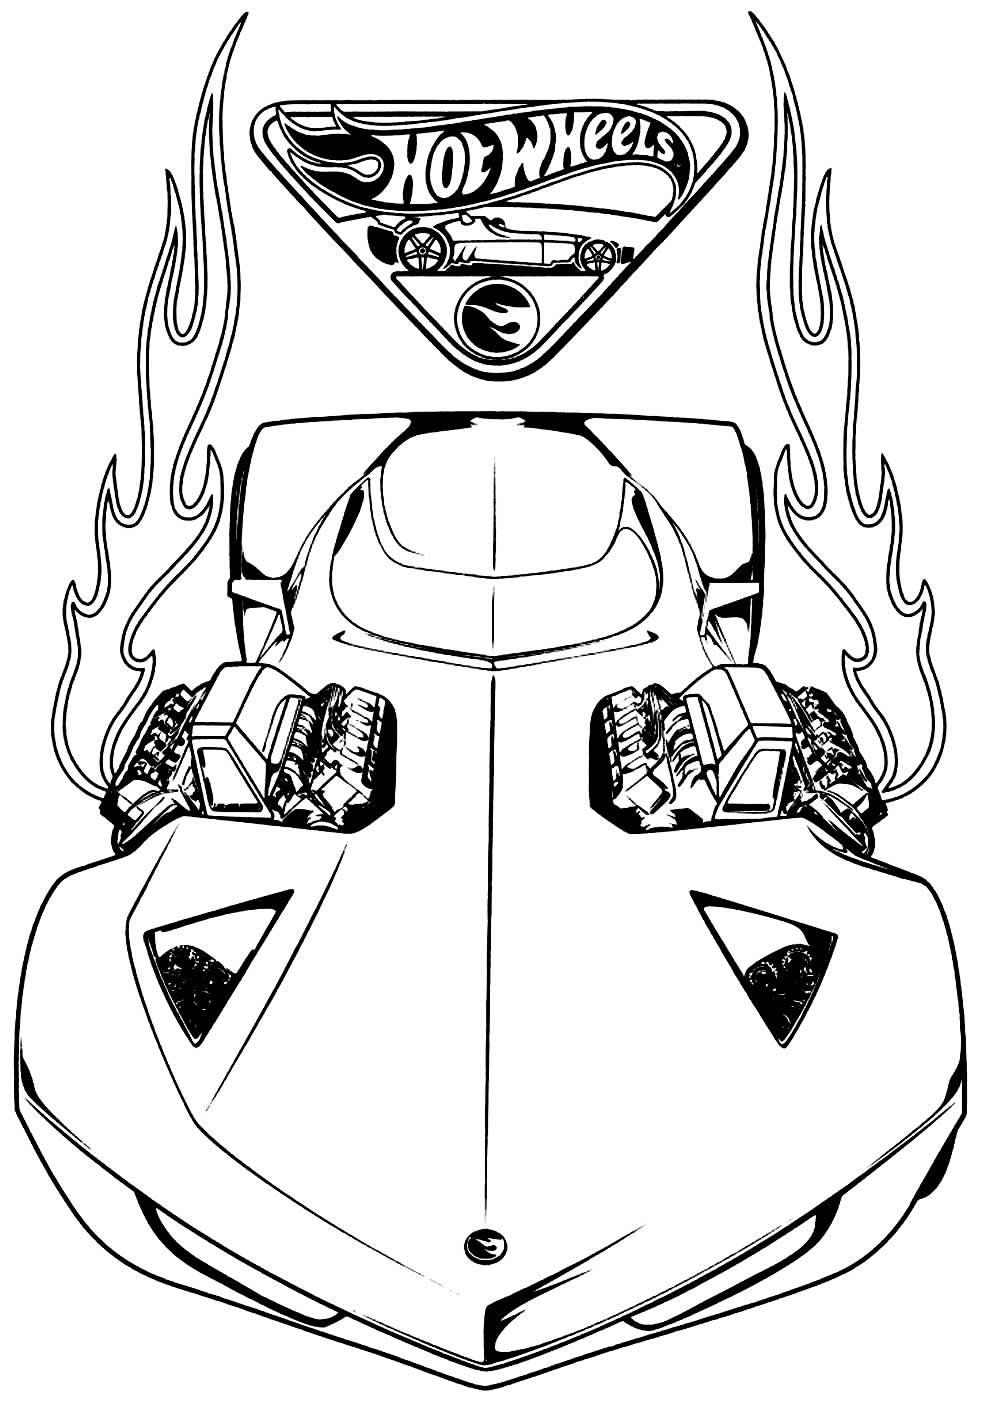 Imagem Hot Wheels para colorir